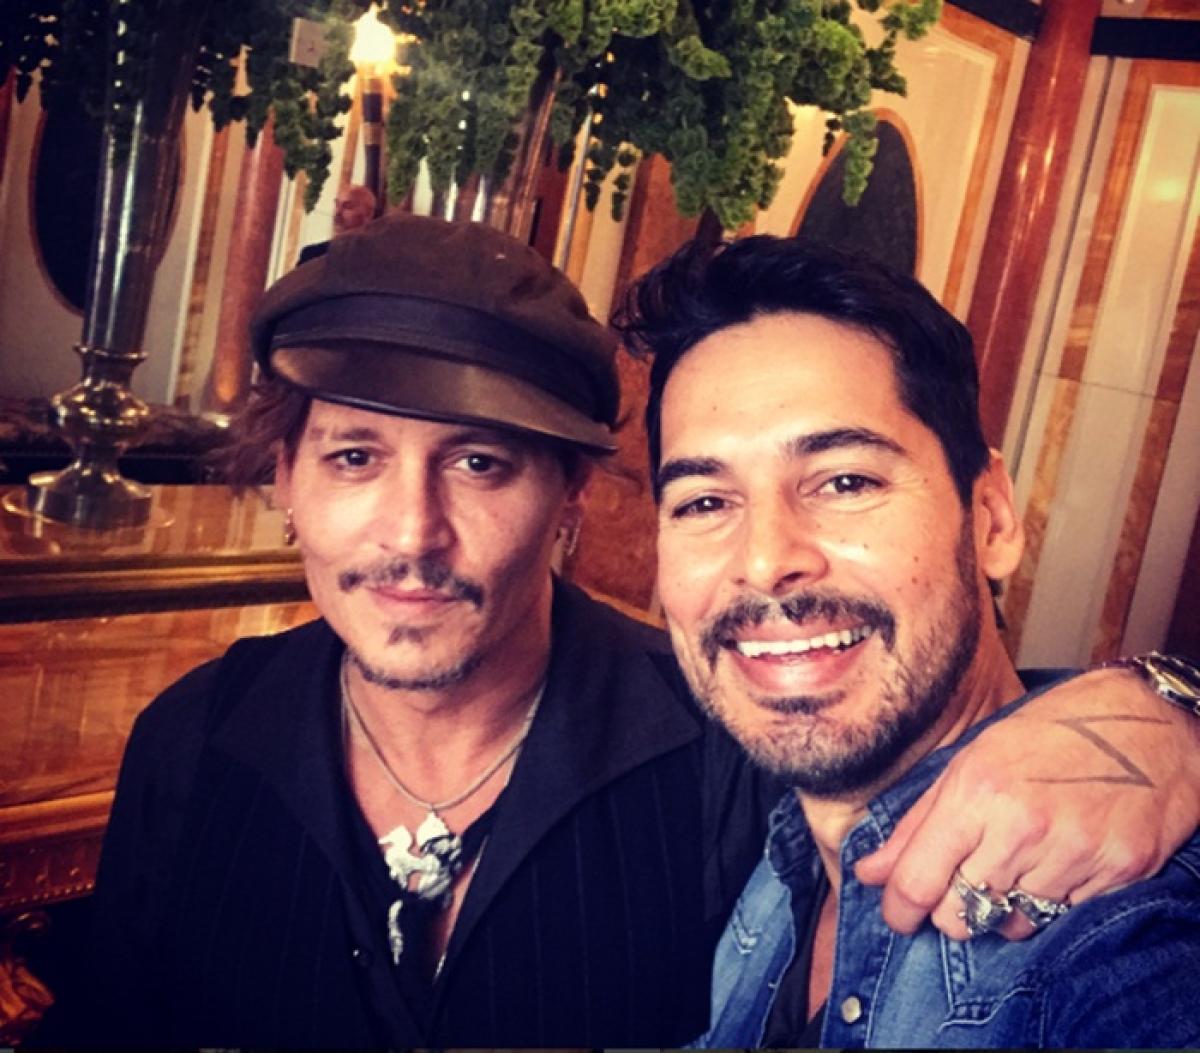 Dino Morea, Nandita Mahtani's 'fan' moment with Johnny Depp